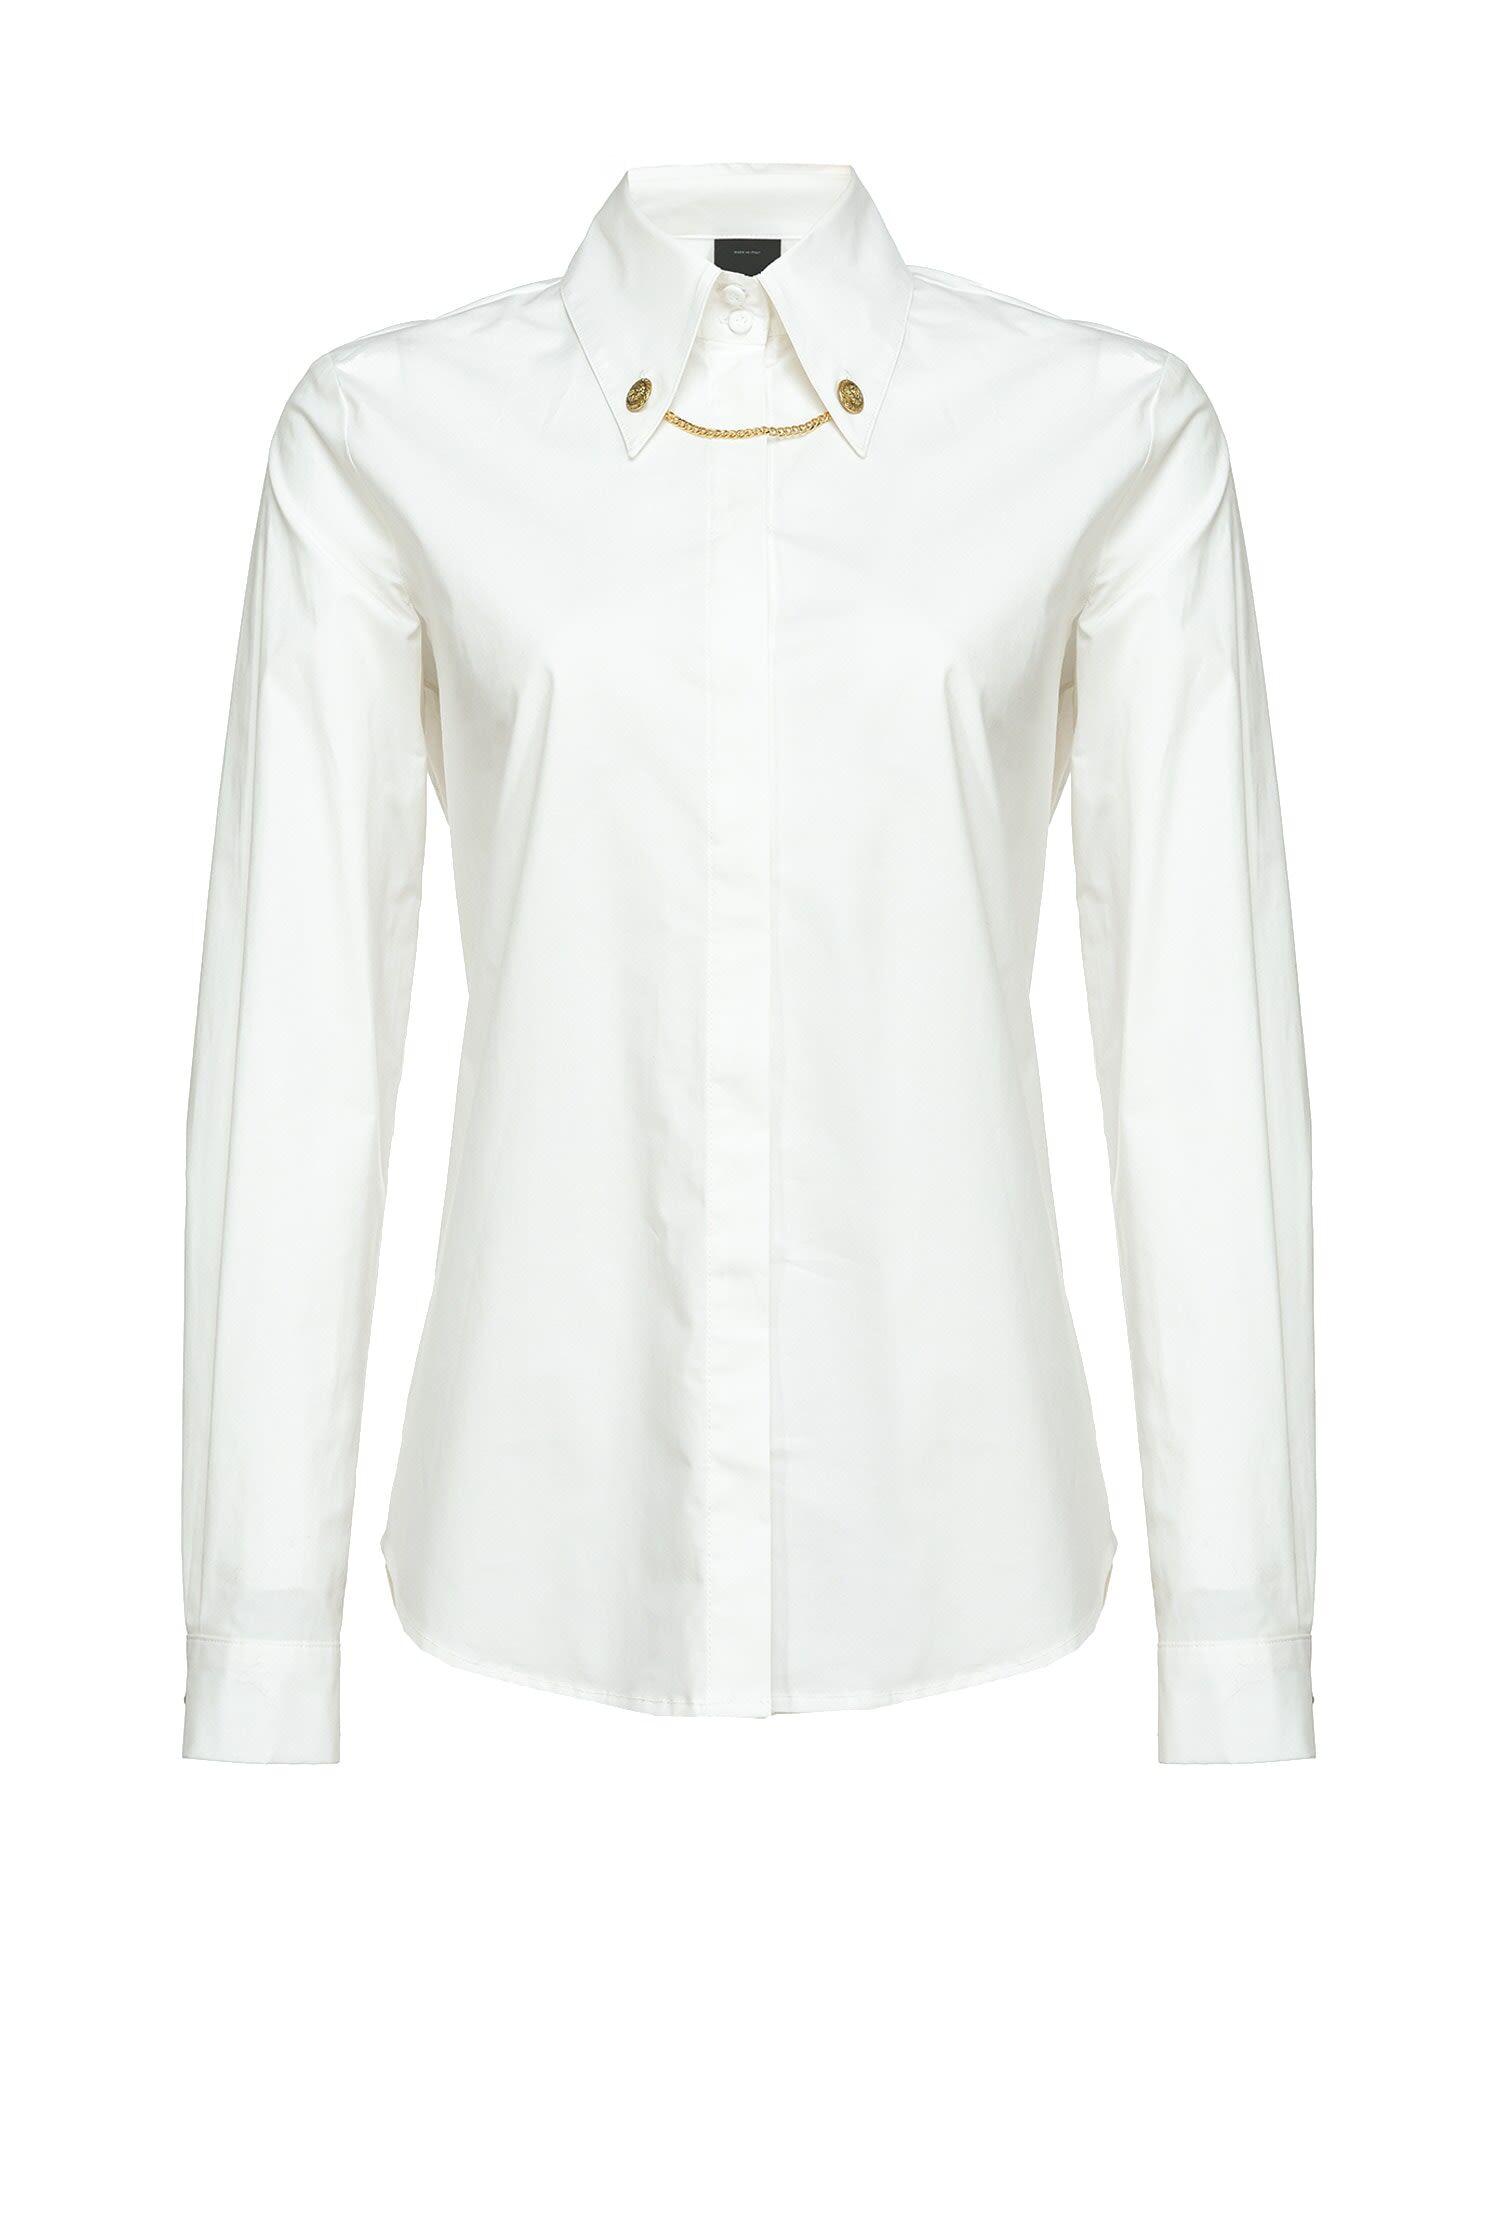 Shirt With Cufflinks On The Collar - Pinko